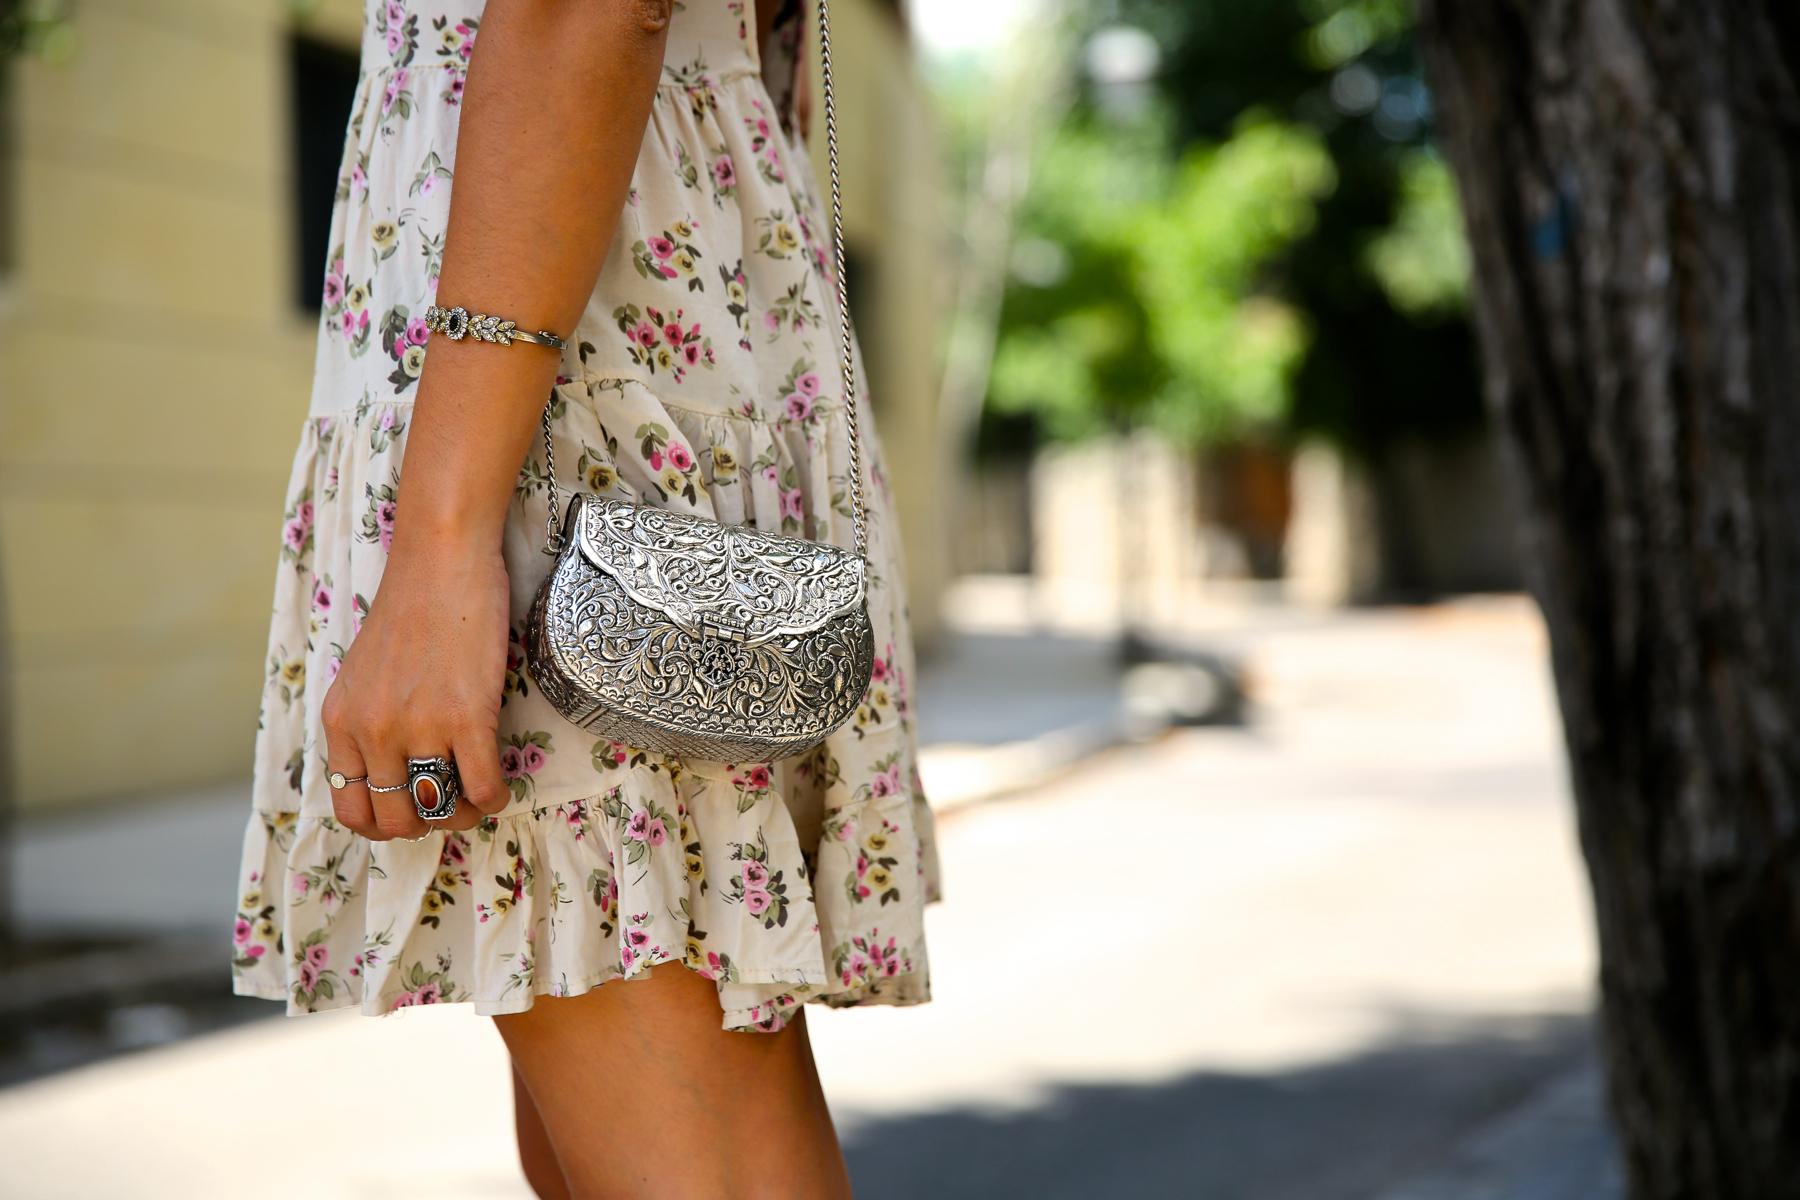 trendy_taste-look-outfit-street_style-ootd-blog-blogger-fashion_spain-moda_españa-vince_camuto-botines_granates-burgundy_booties-flower_print-estampado_flores-silver_bag-bolso_plata-estampado_flores-boho-top-2